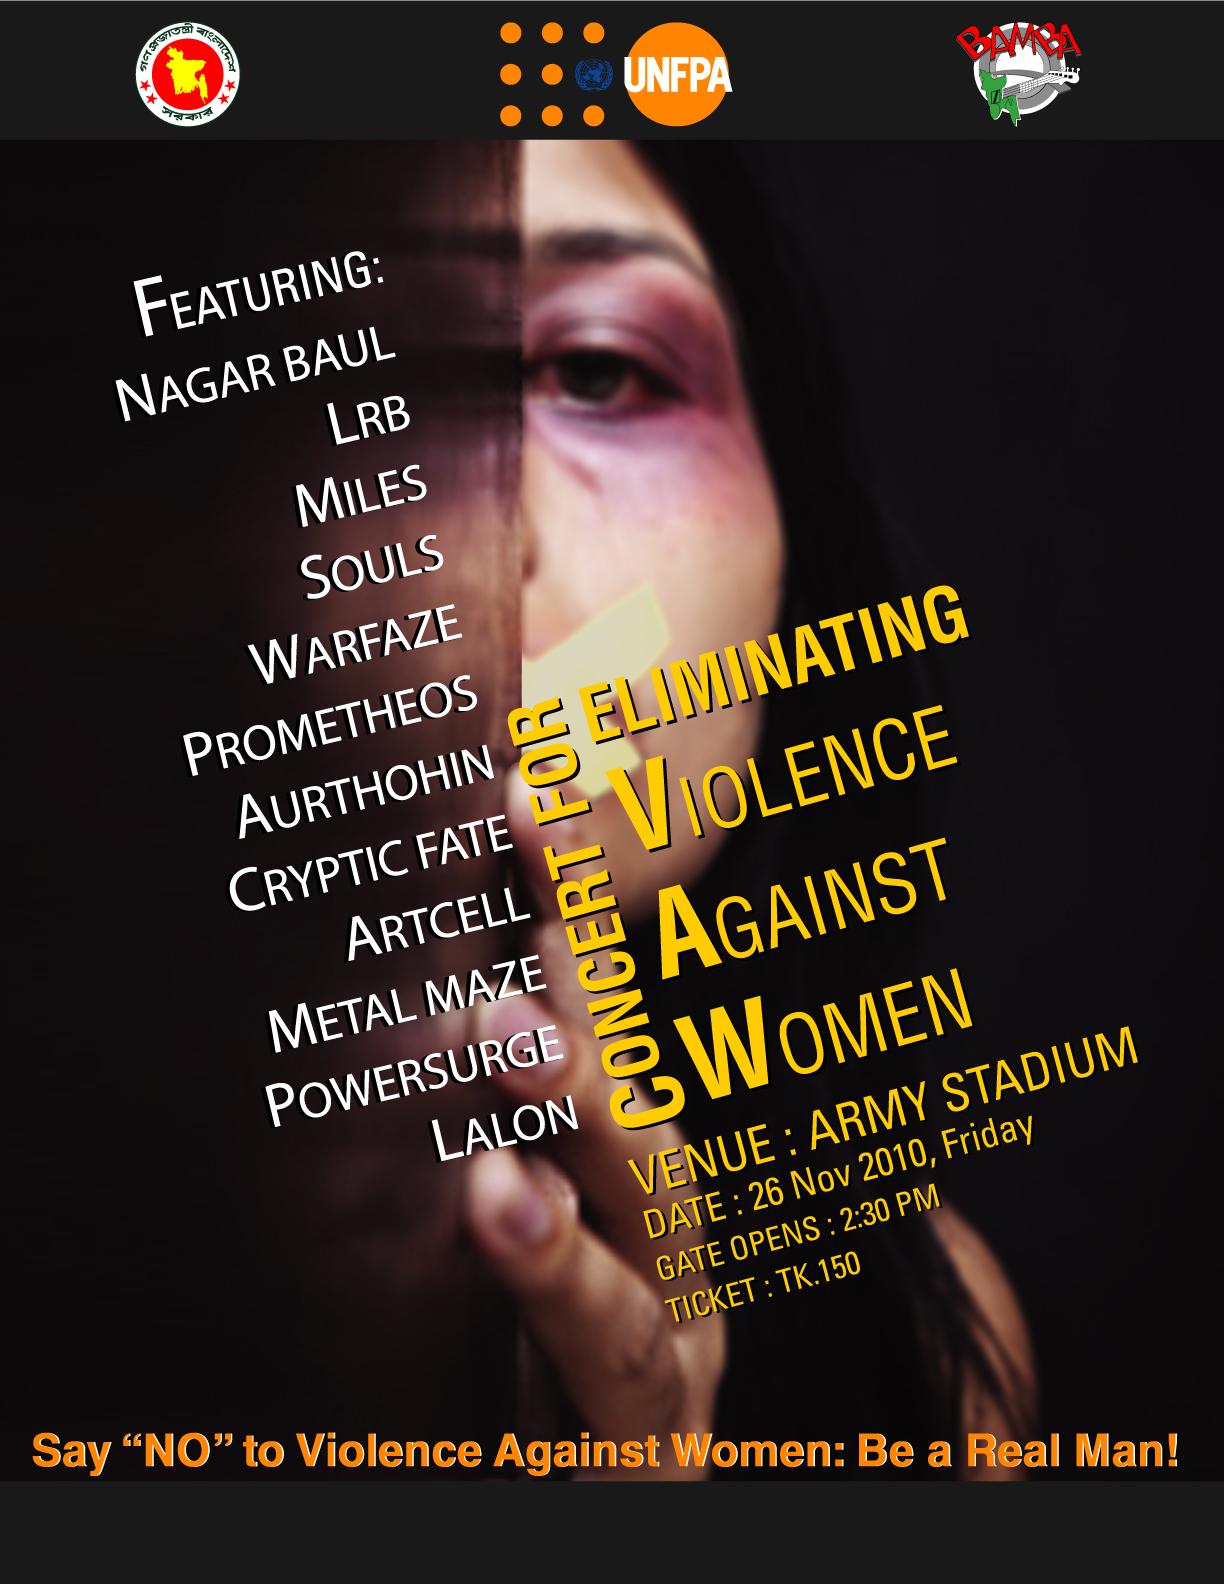 Poster for concert on eliminating violence against women